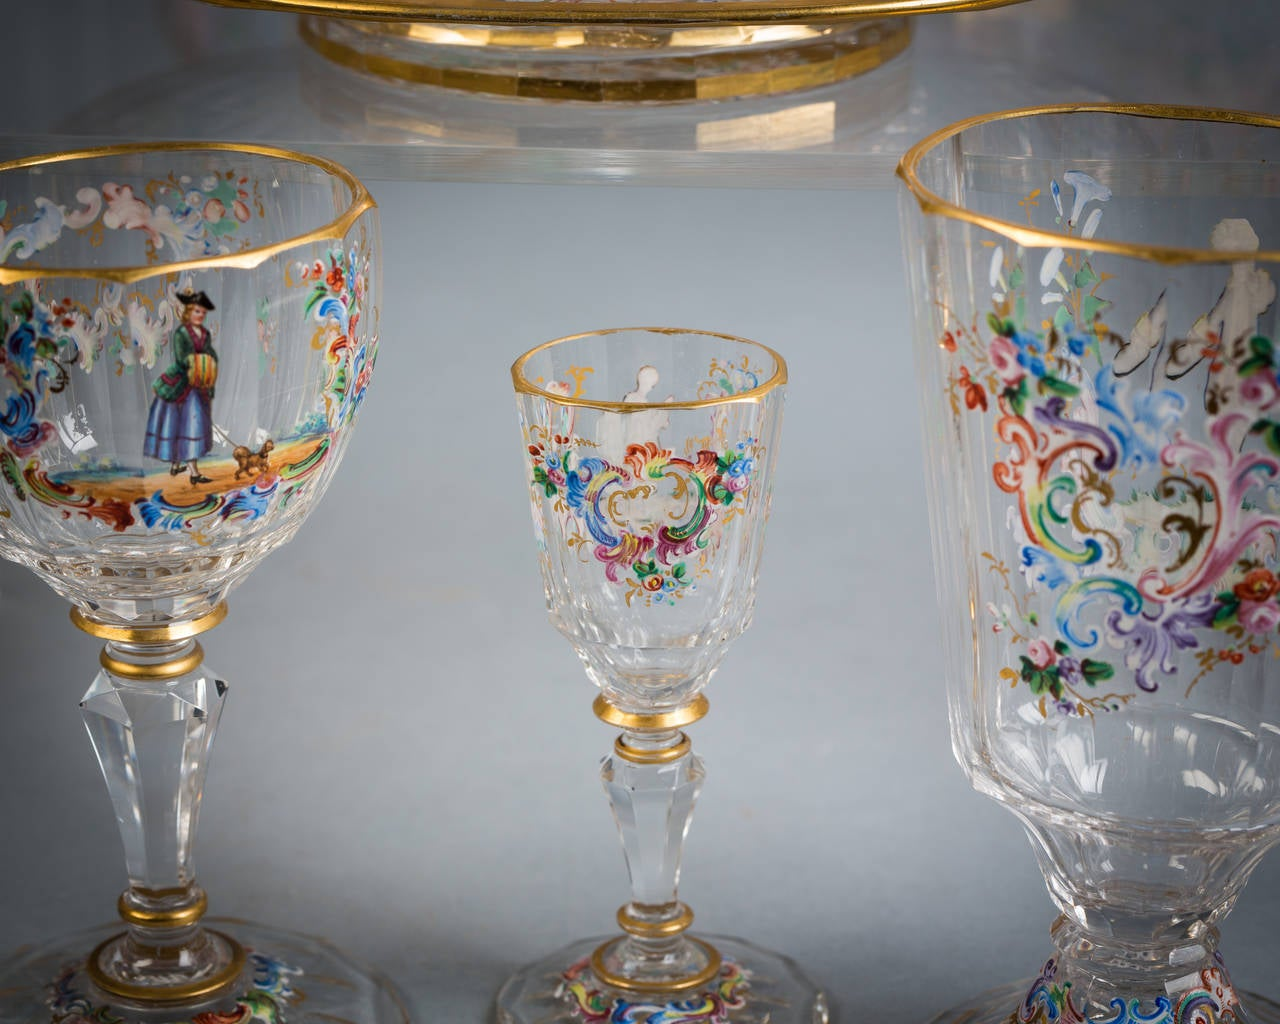 Austrian Enamel Table Glassware, Lobmeyr, circa 1890 For Sale 4